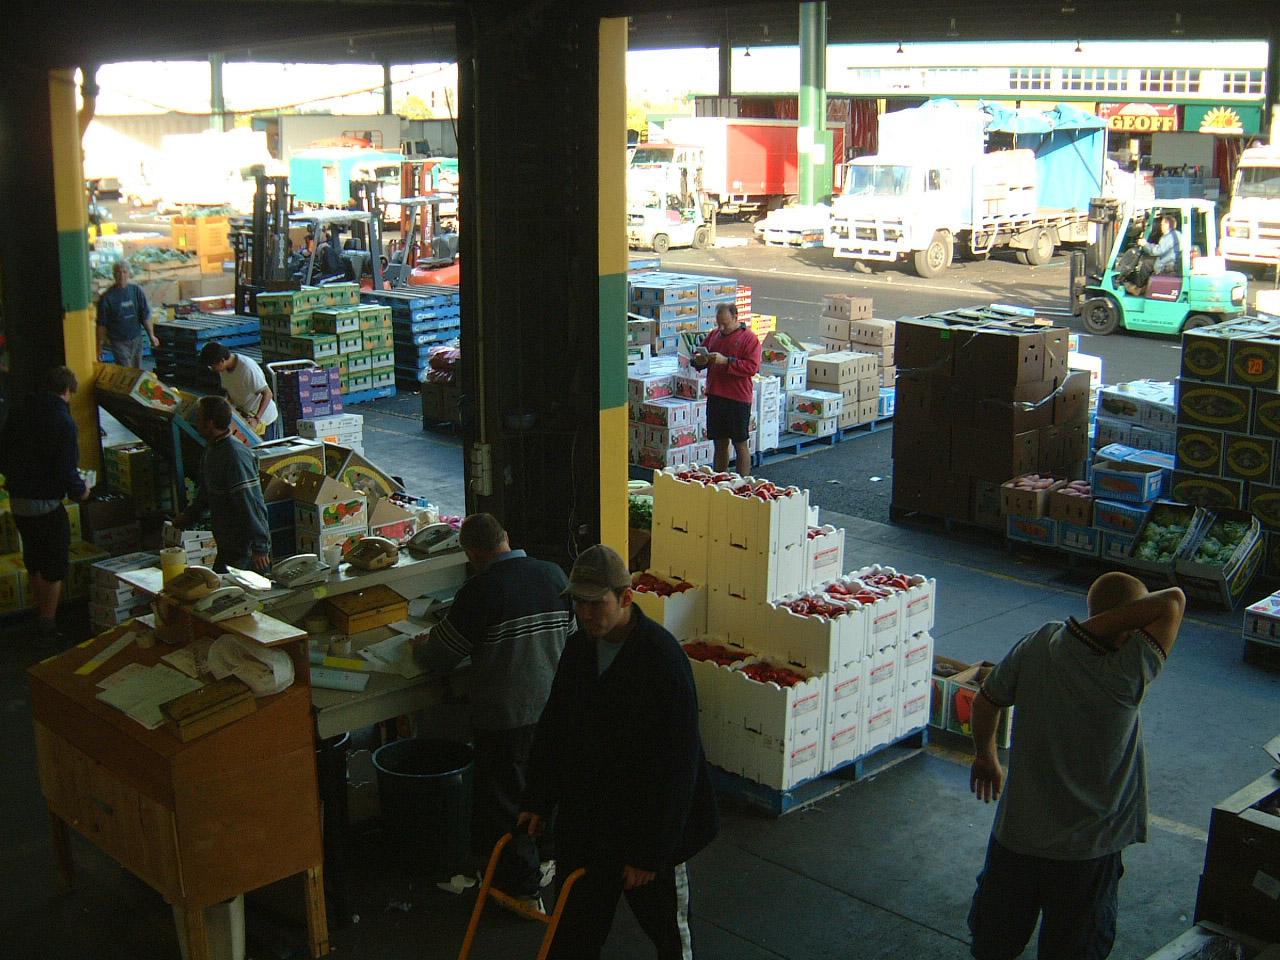 Brisbane Markets Sherwood Road Rocklea Queensland 4106 Jun 2002 I14